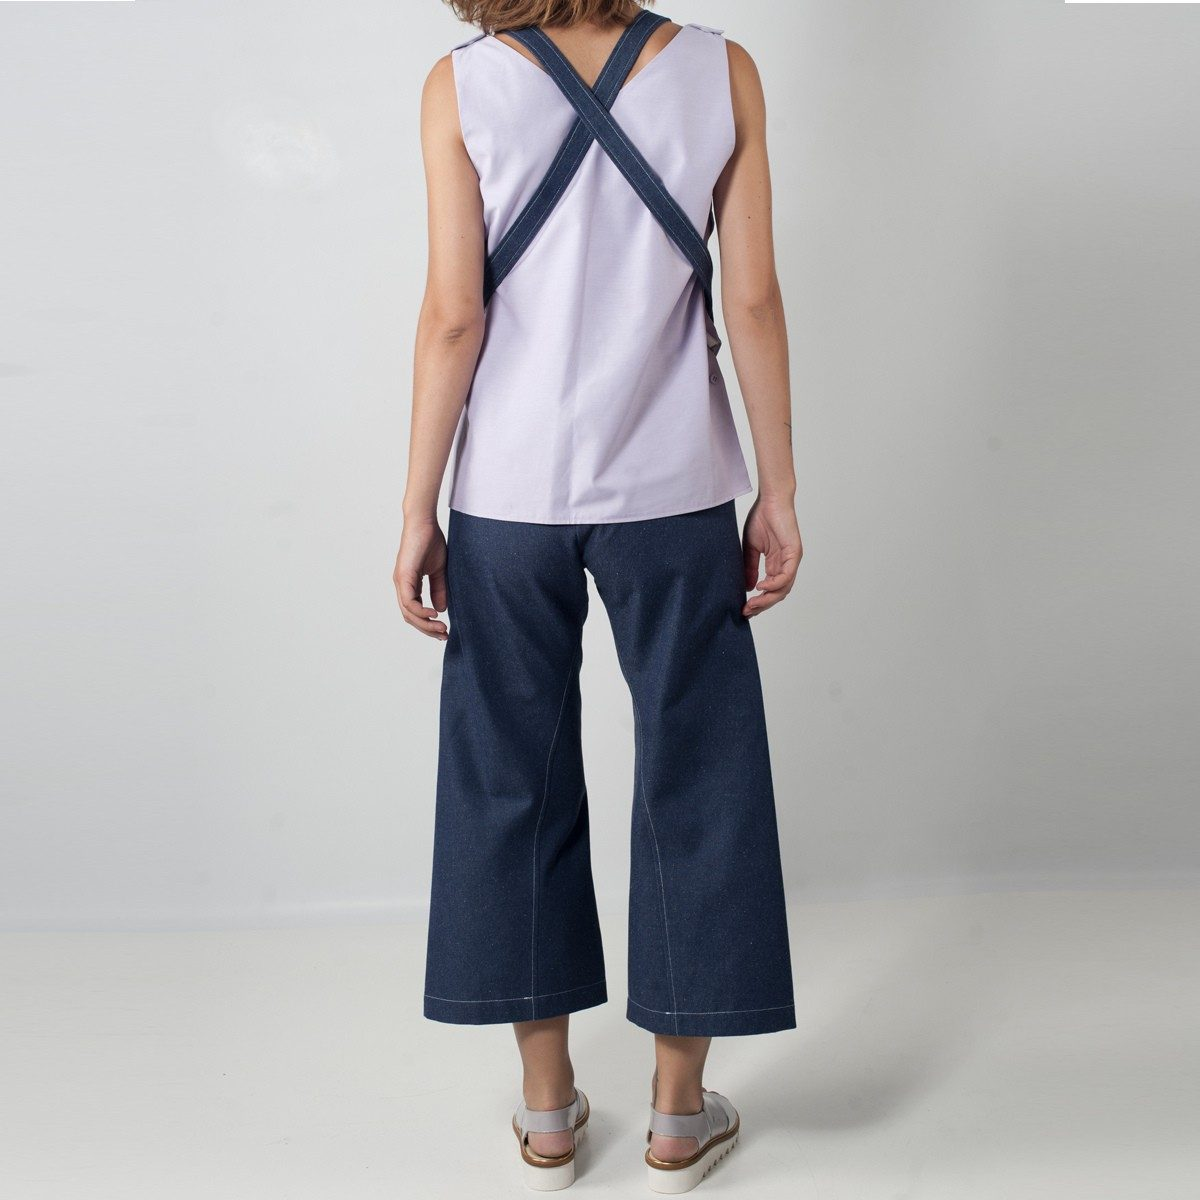 WYLDE - salopette jeans dos